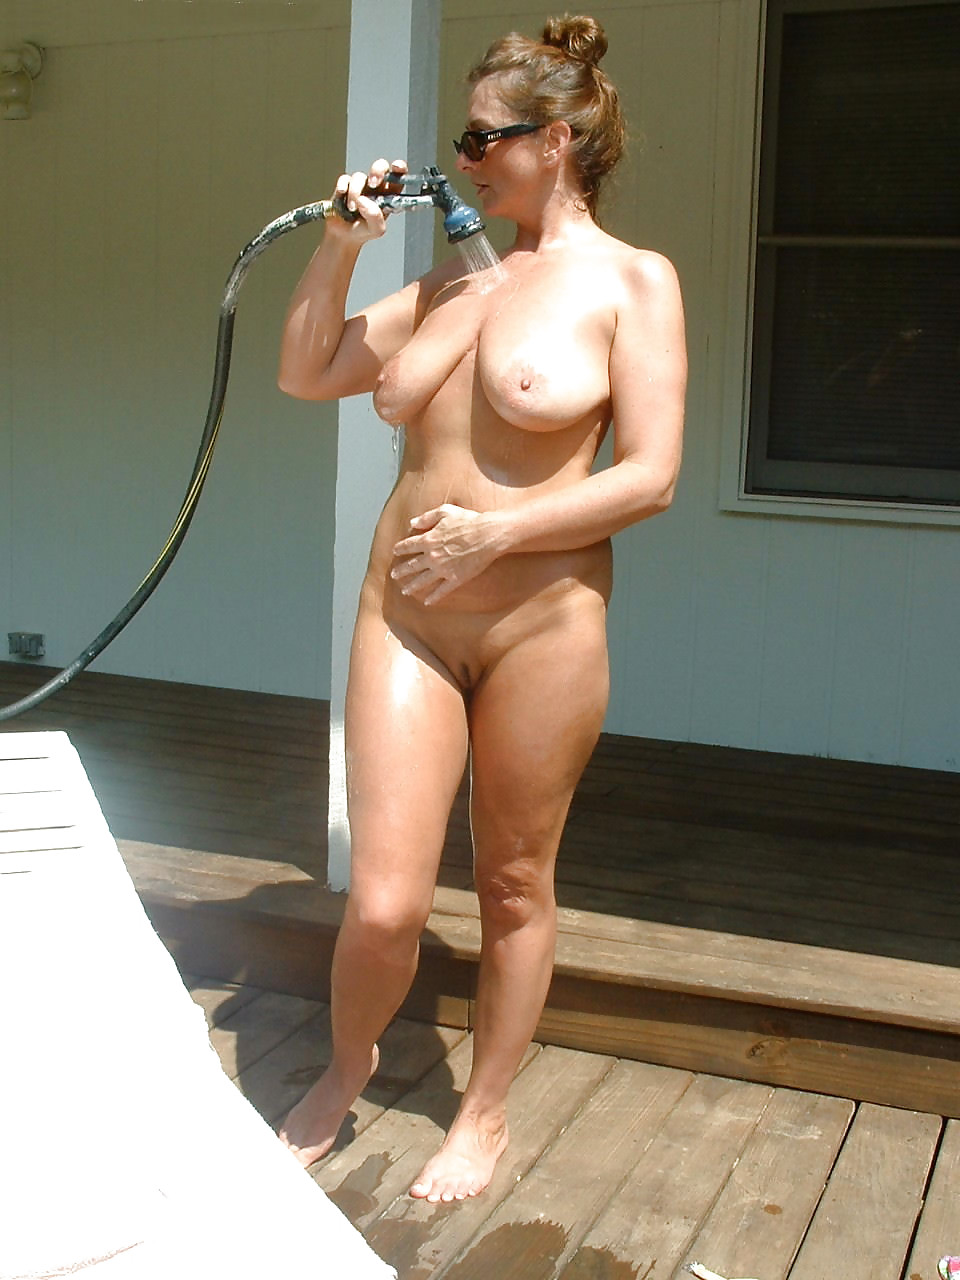 Hot porno Softcore video girl getting nude